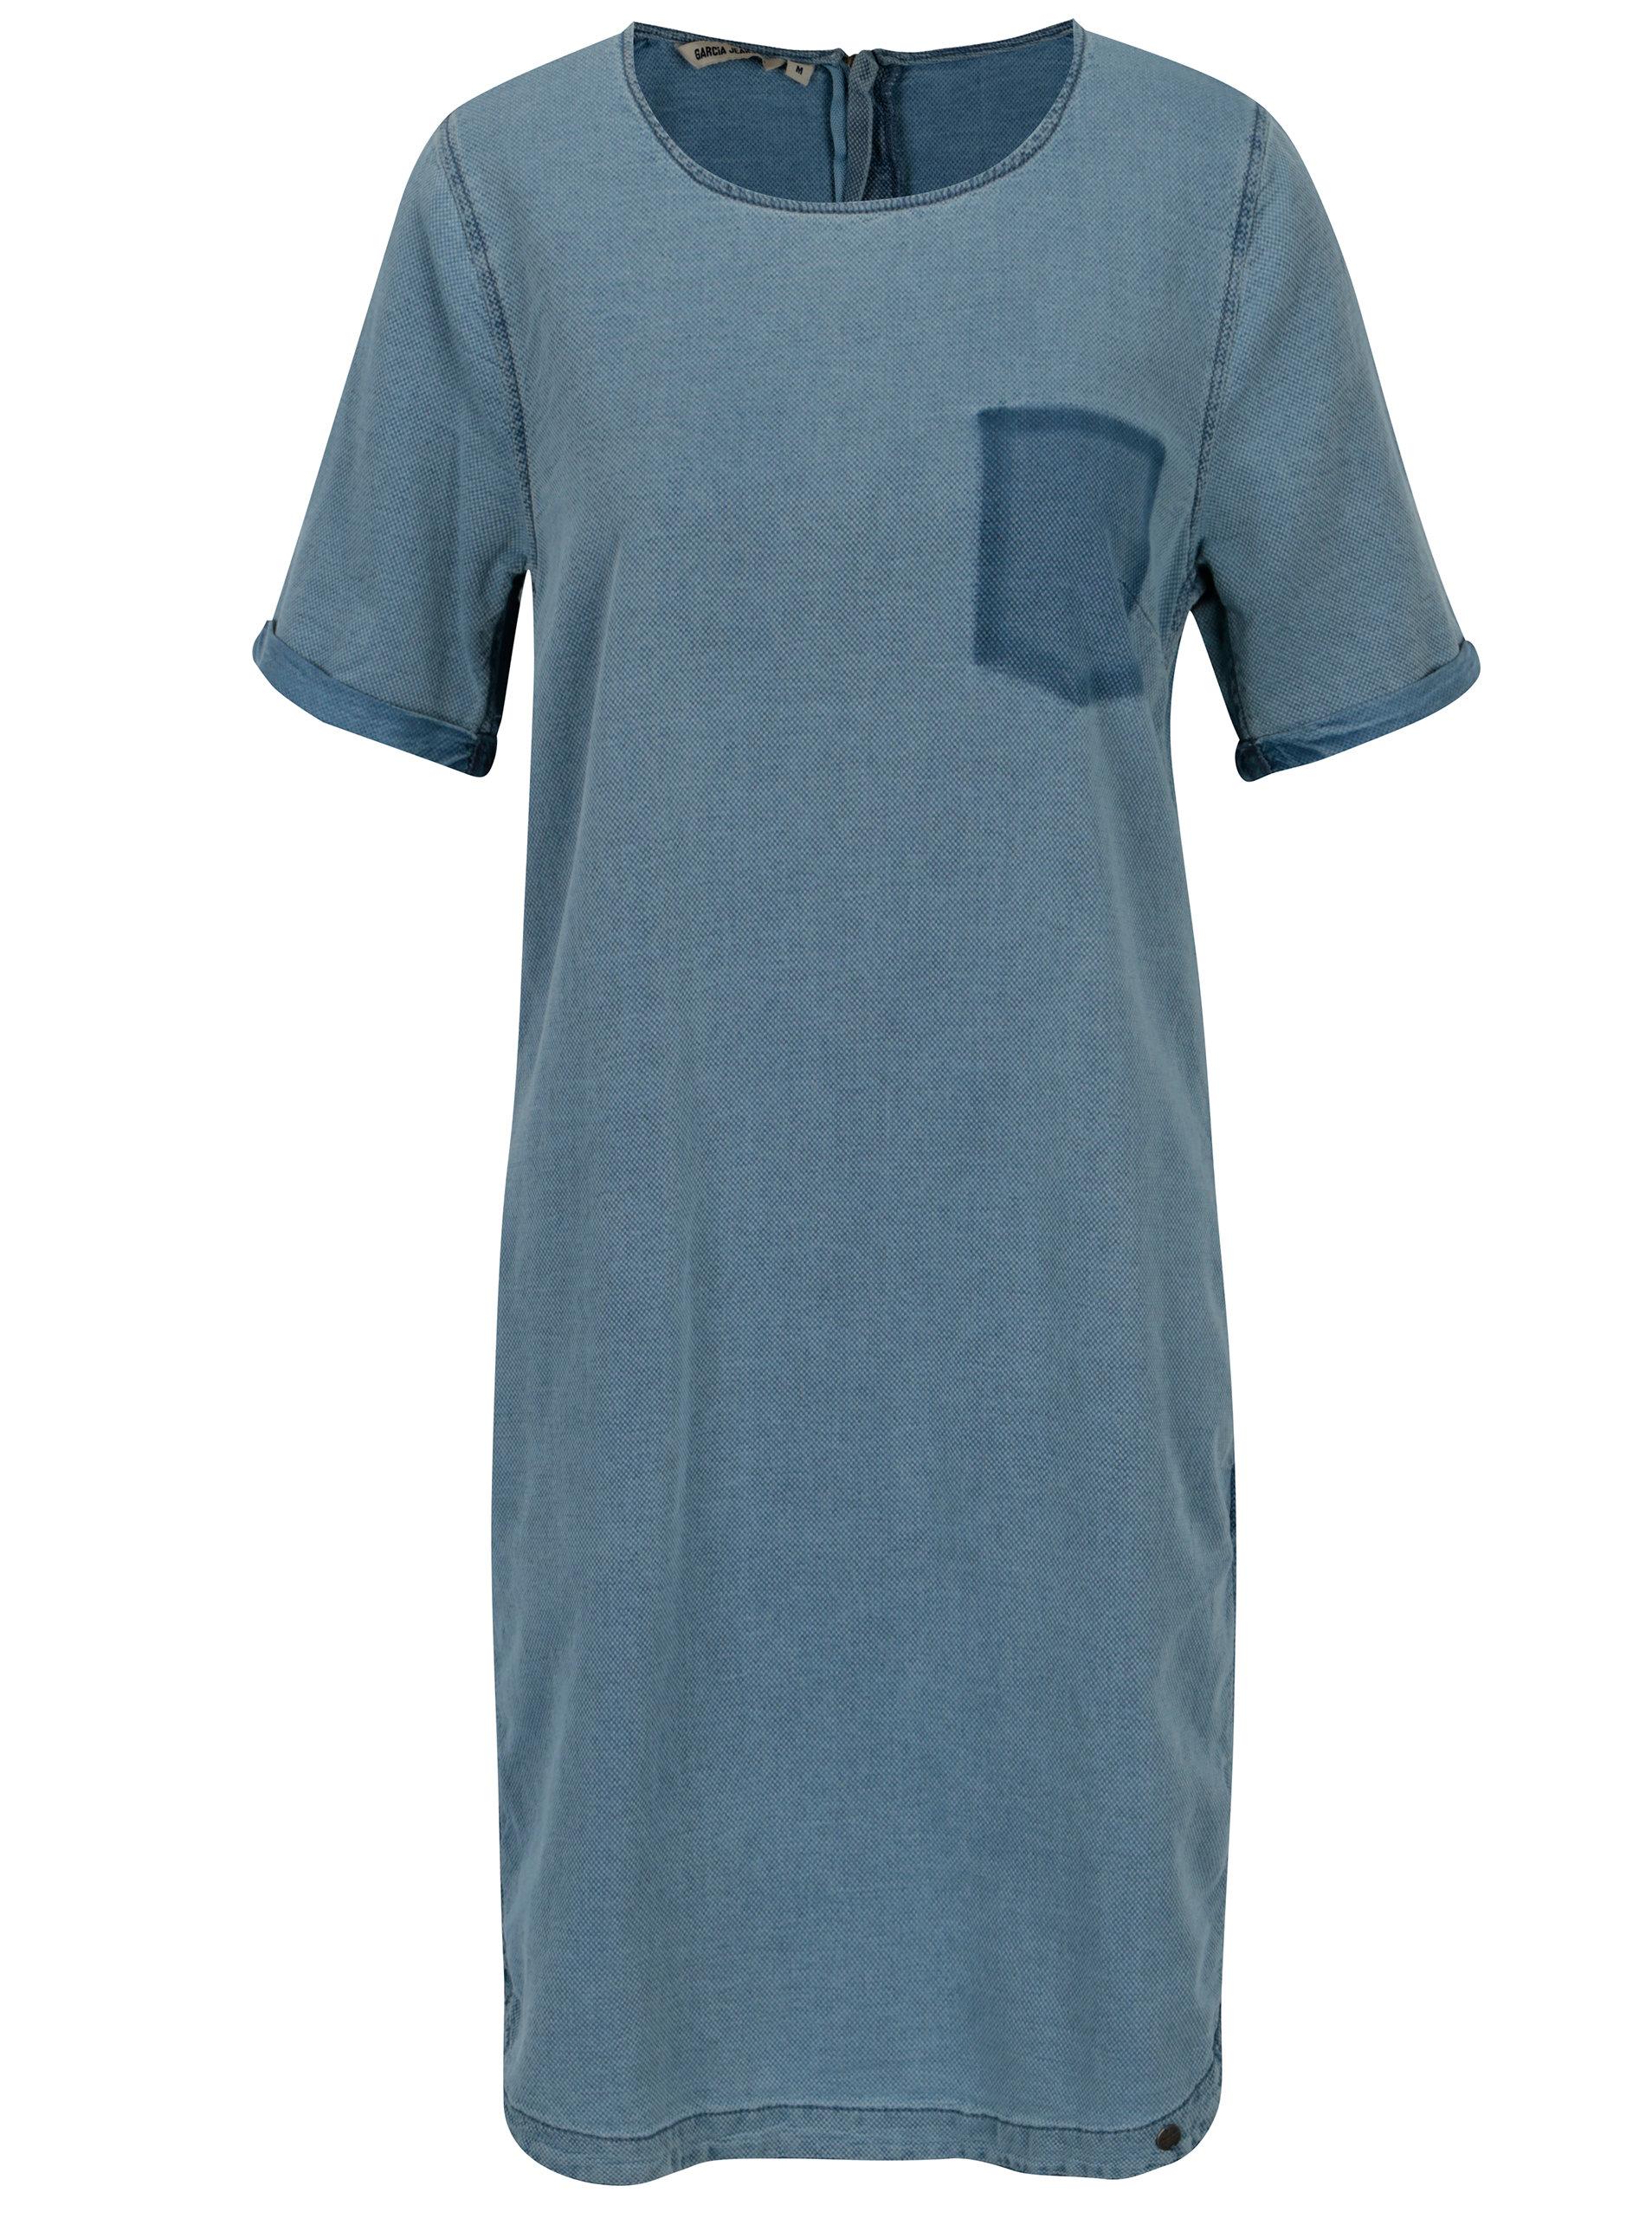 a488894ad8de Modré dámske šaty s vreckami Garcia Jeans ...